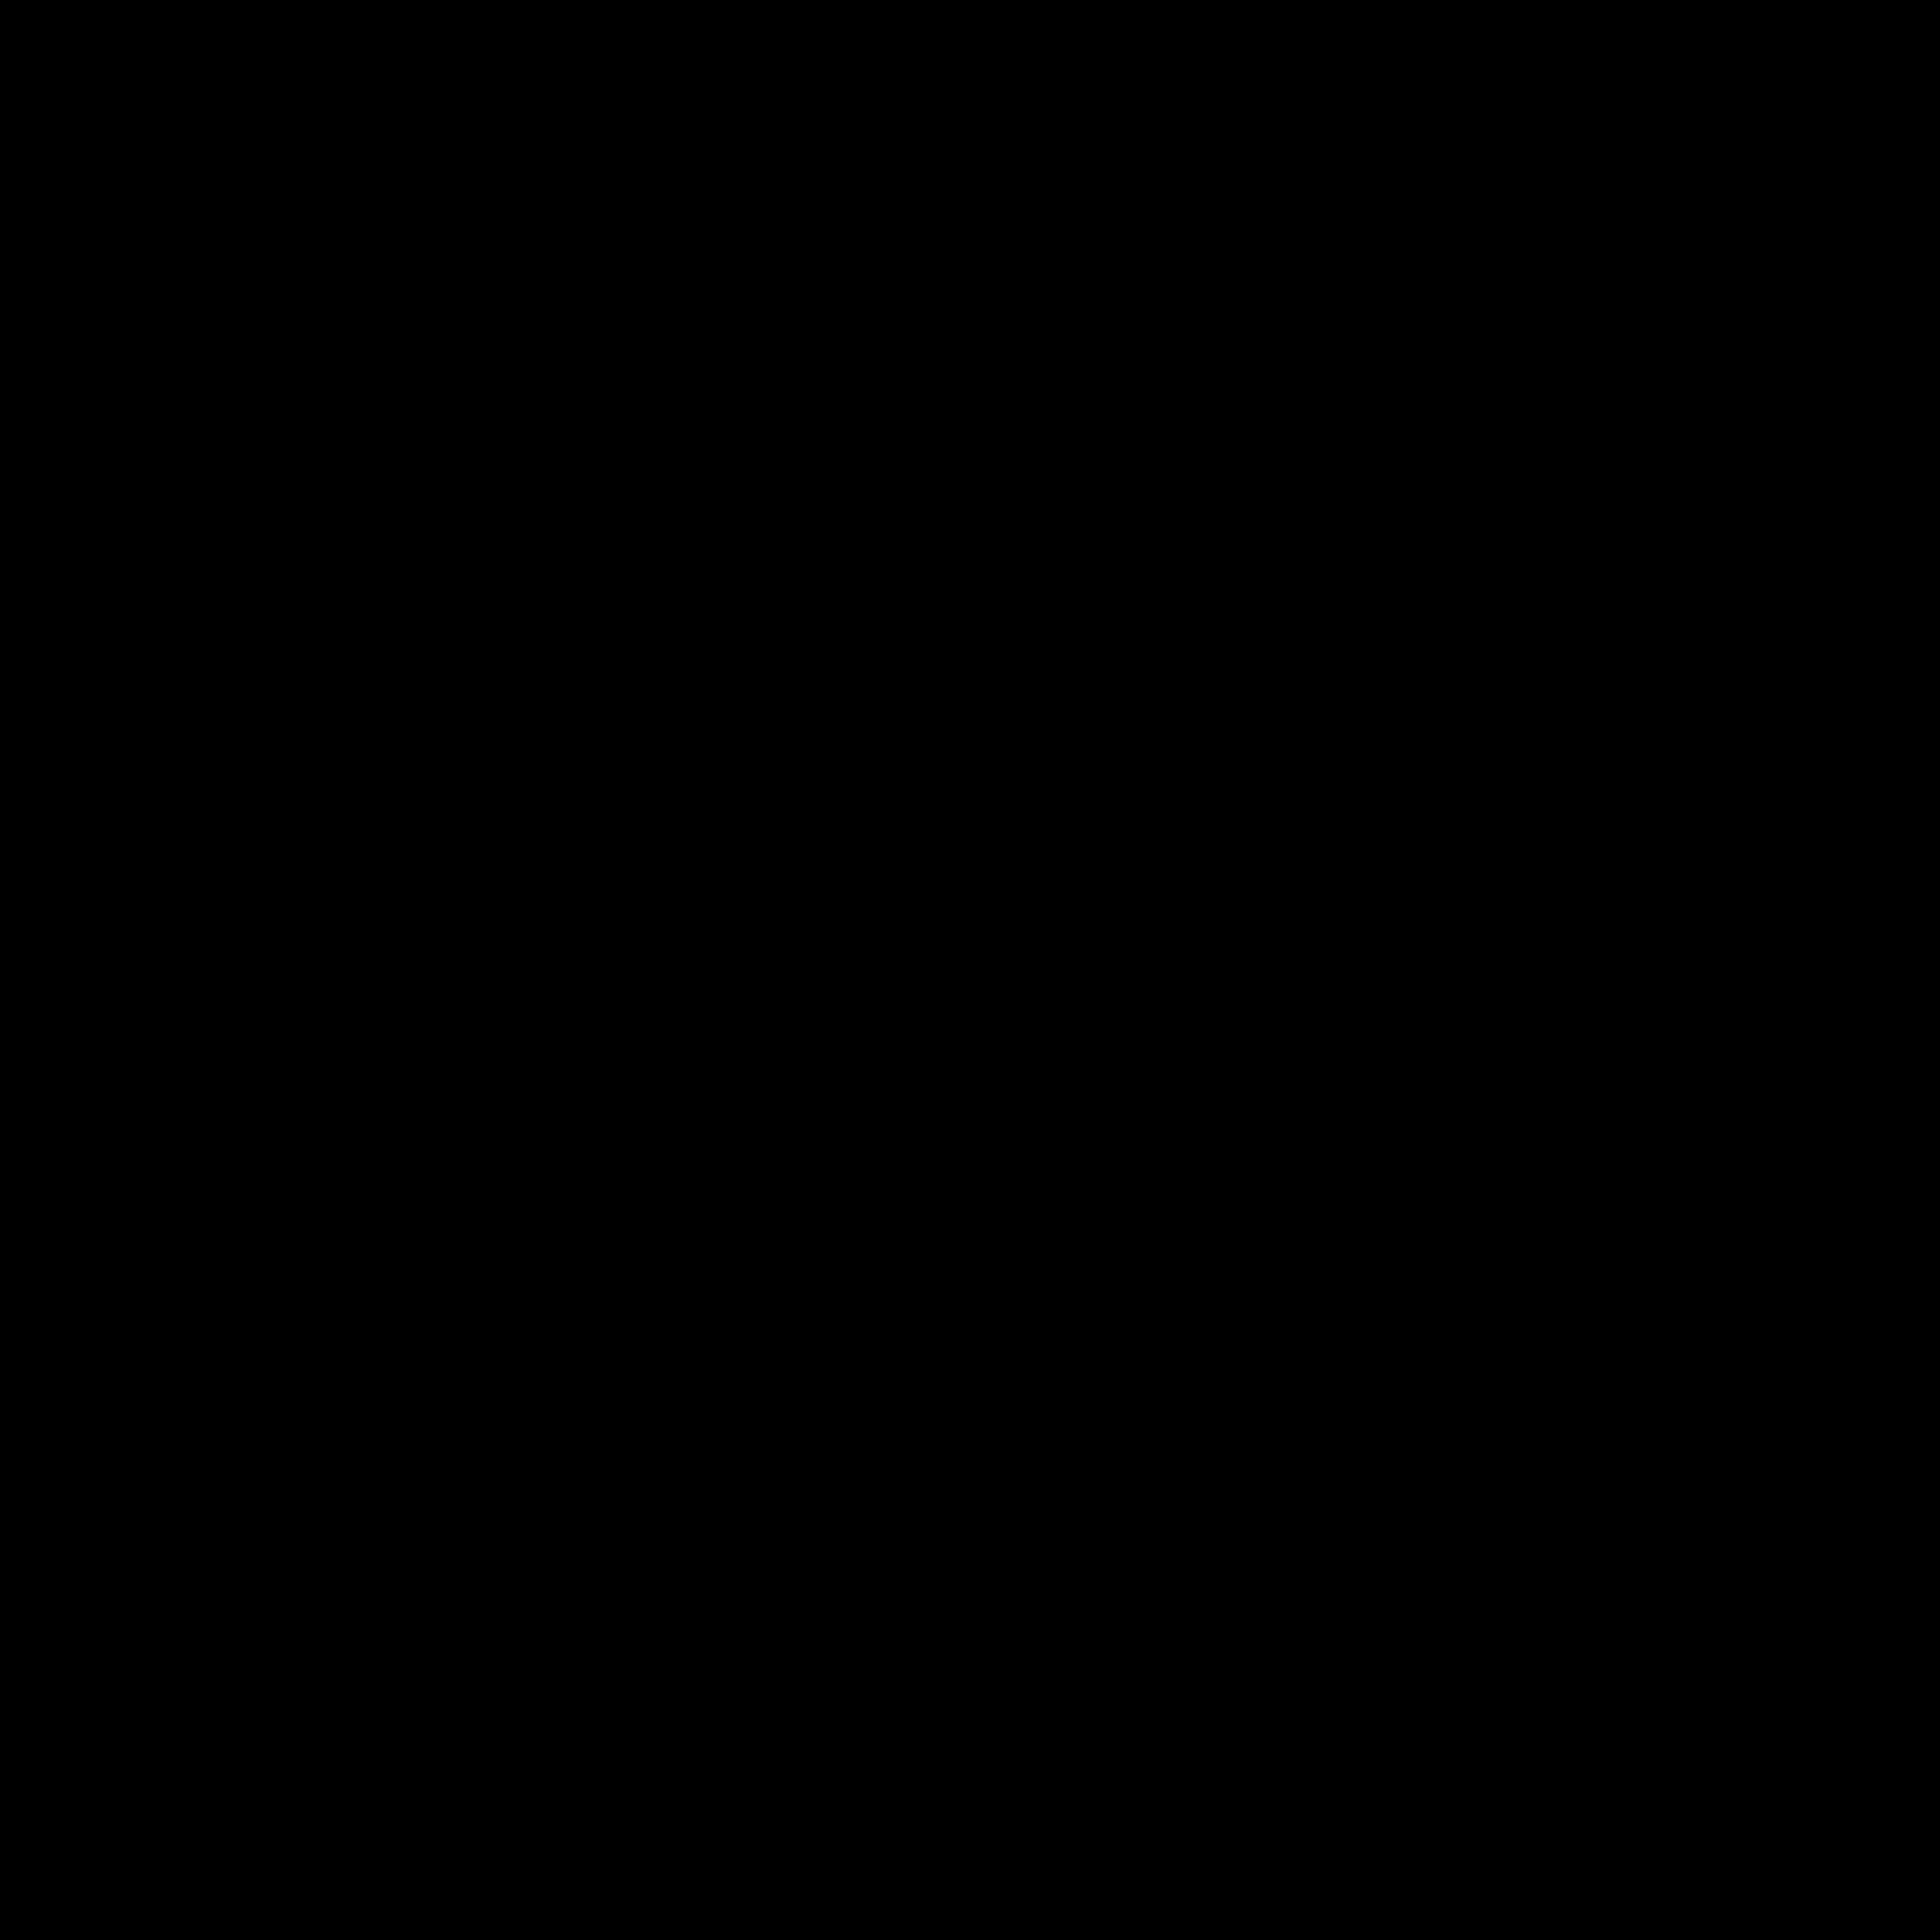 ADP-39S